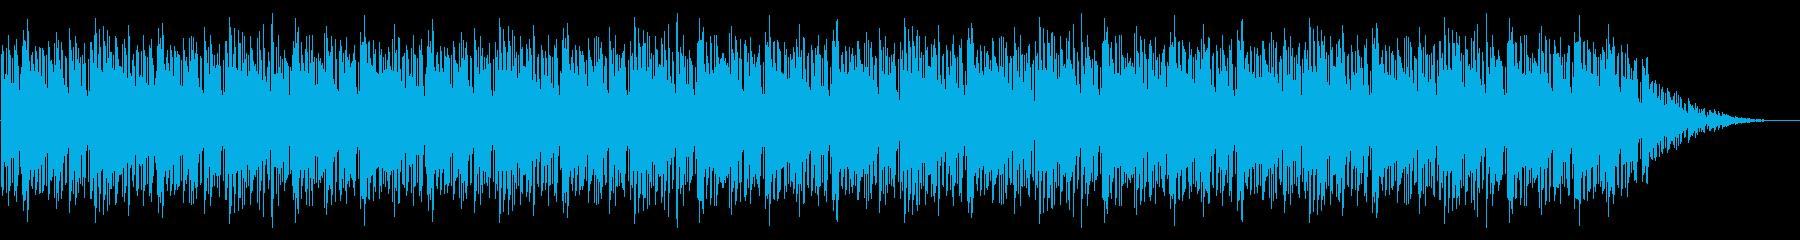 GB風対戦格闘ゲームのステージセレクトの再生済みの波形